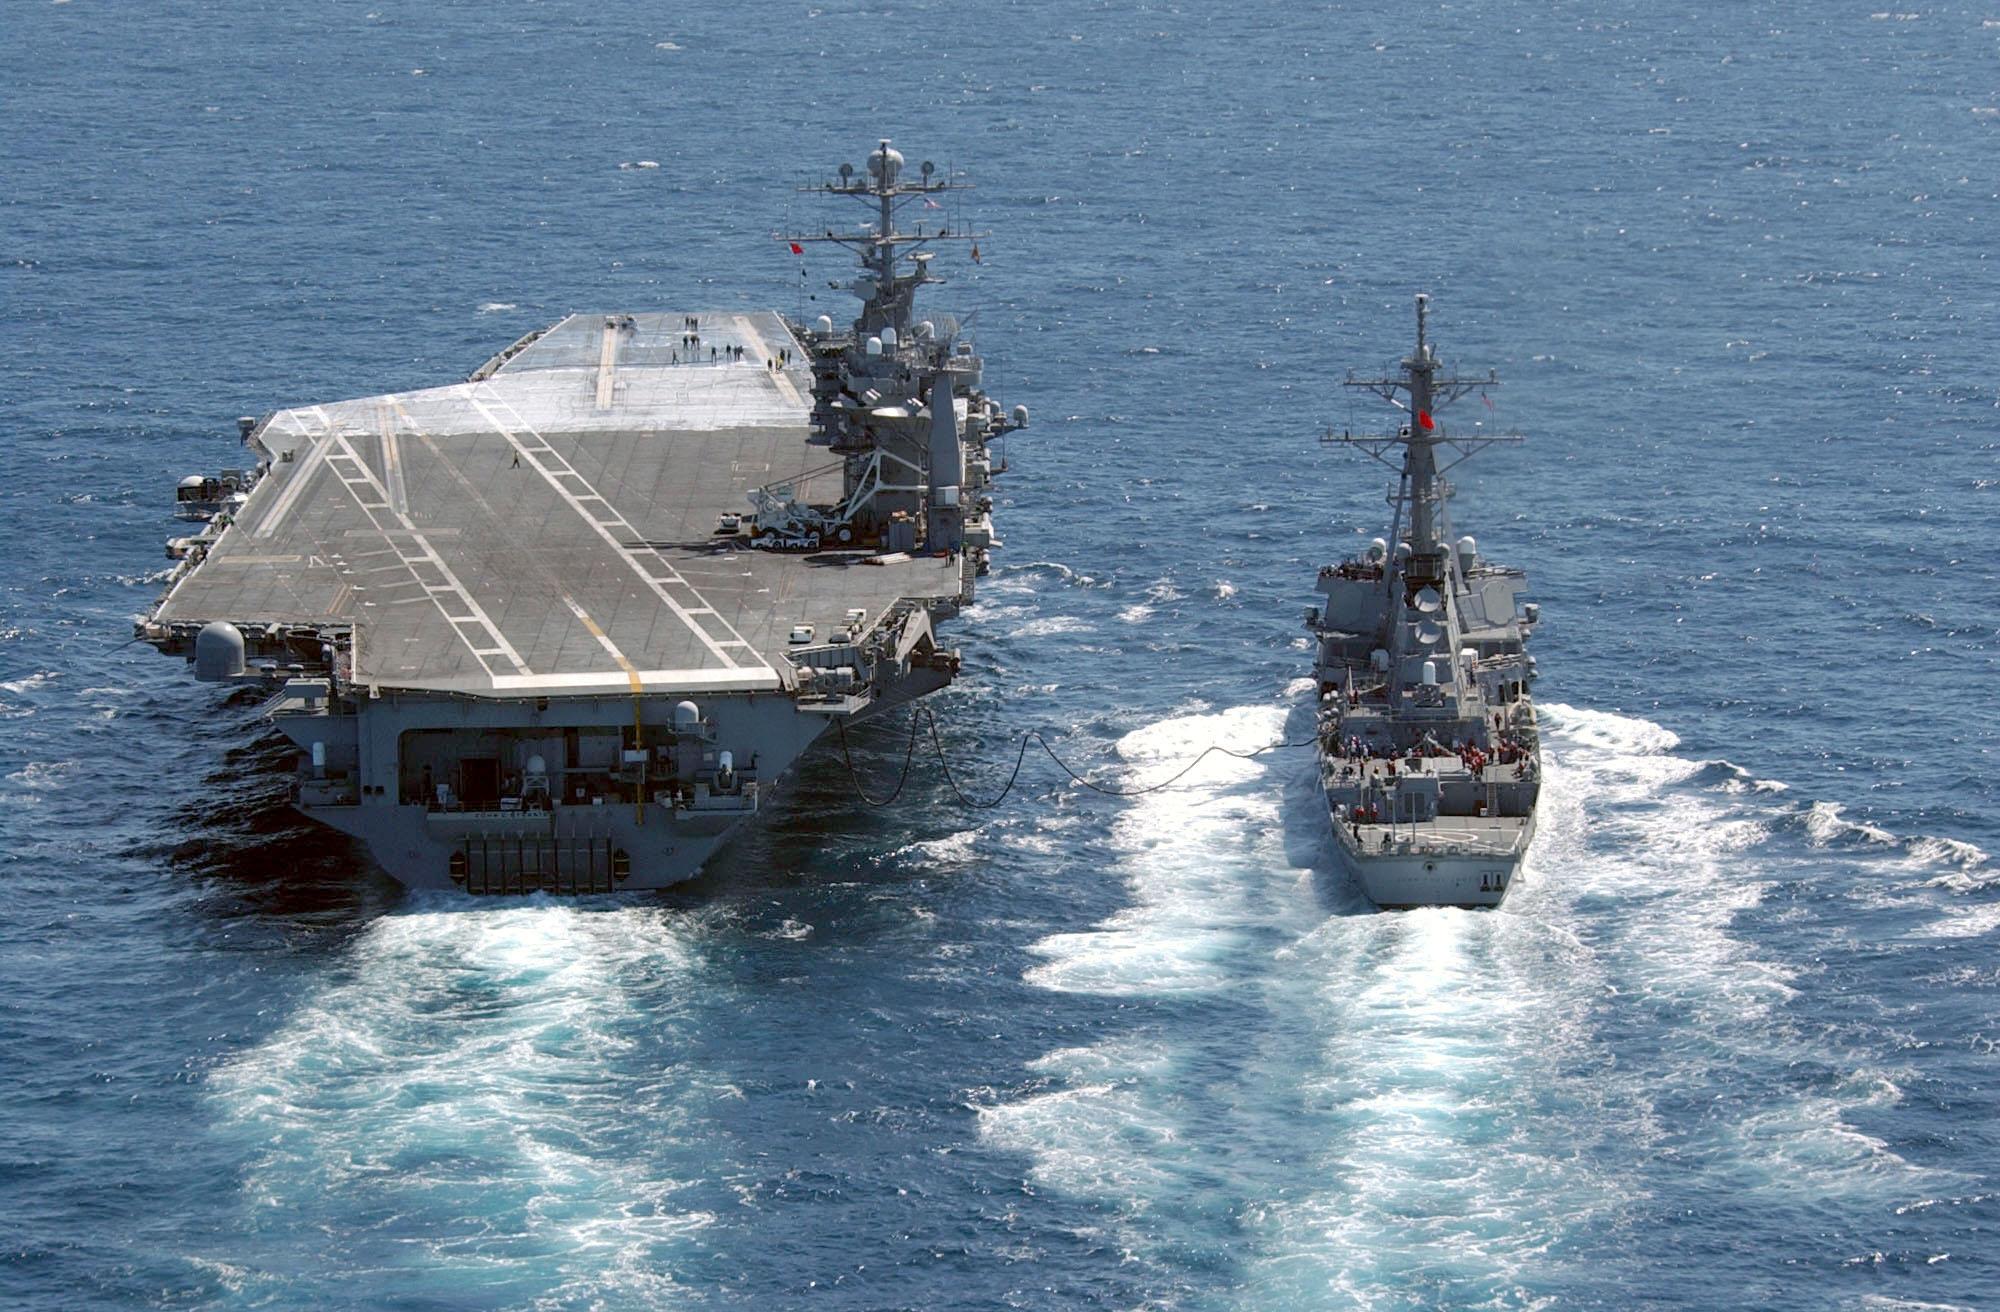 Aircraft Carrier clipart destroyer #5